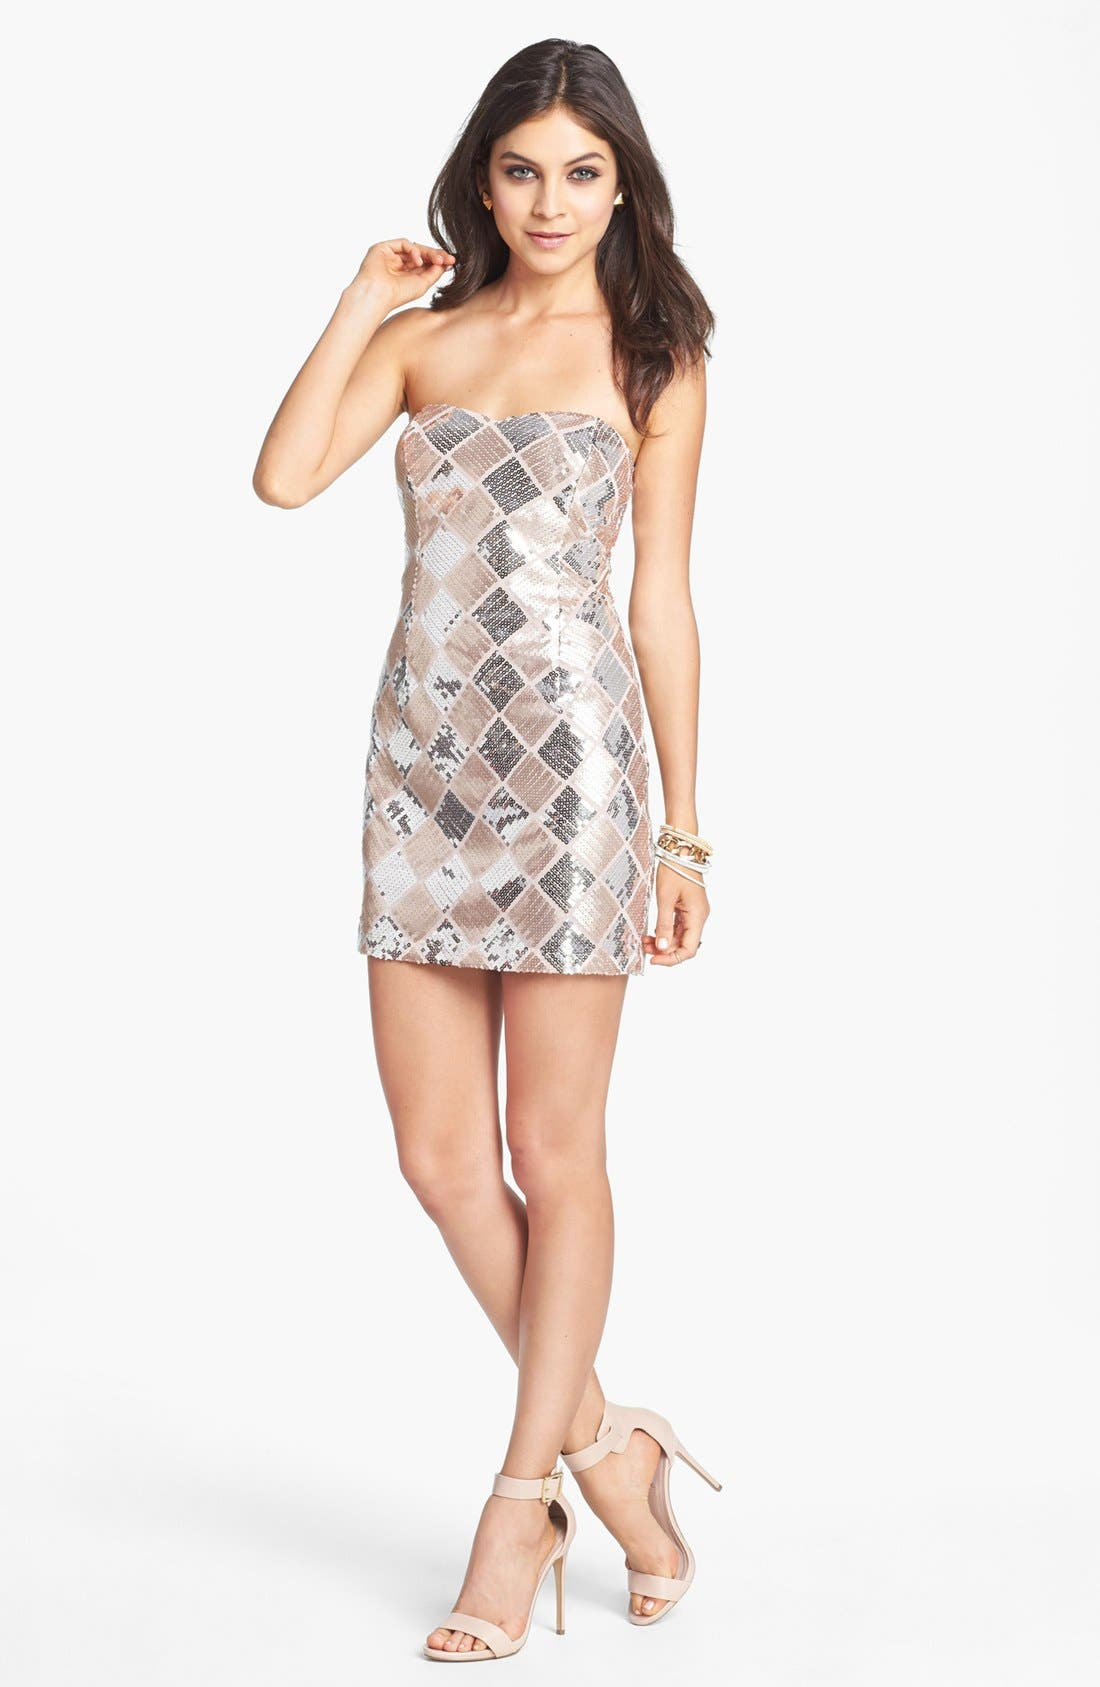 TRIXXI, Checkered Sequin Tube Dress, Main thumbnail 1, color, 660